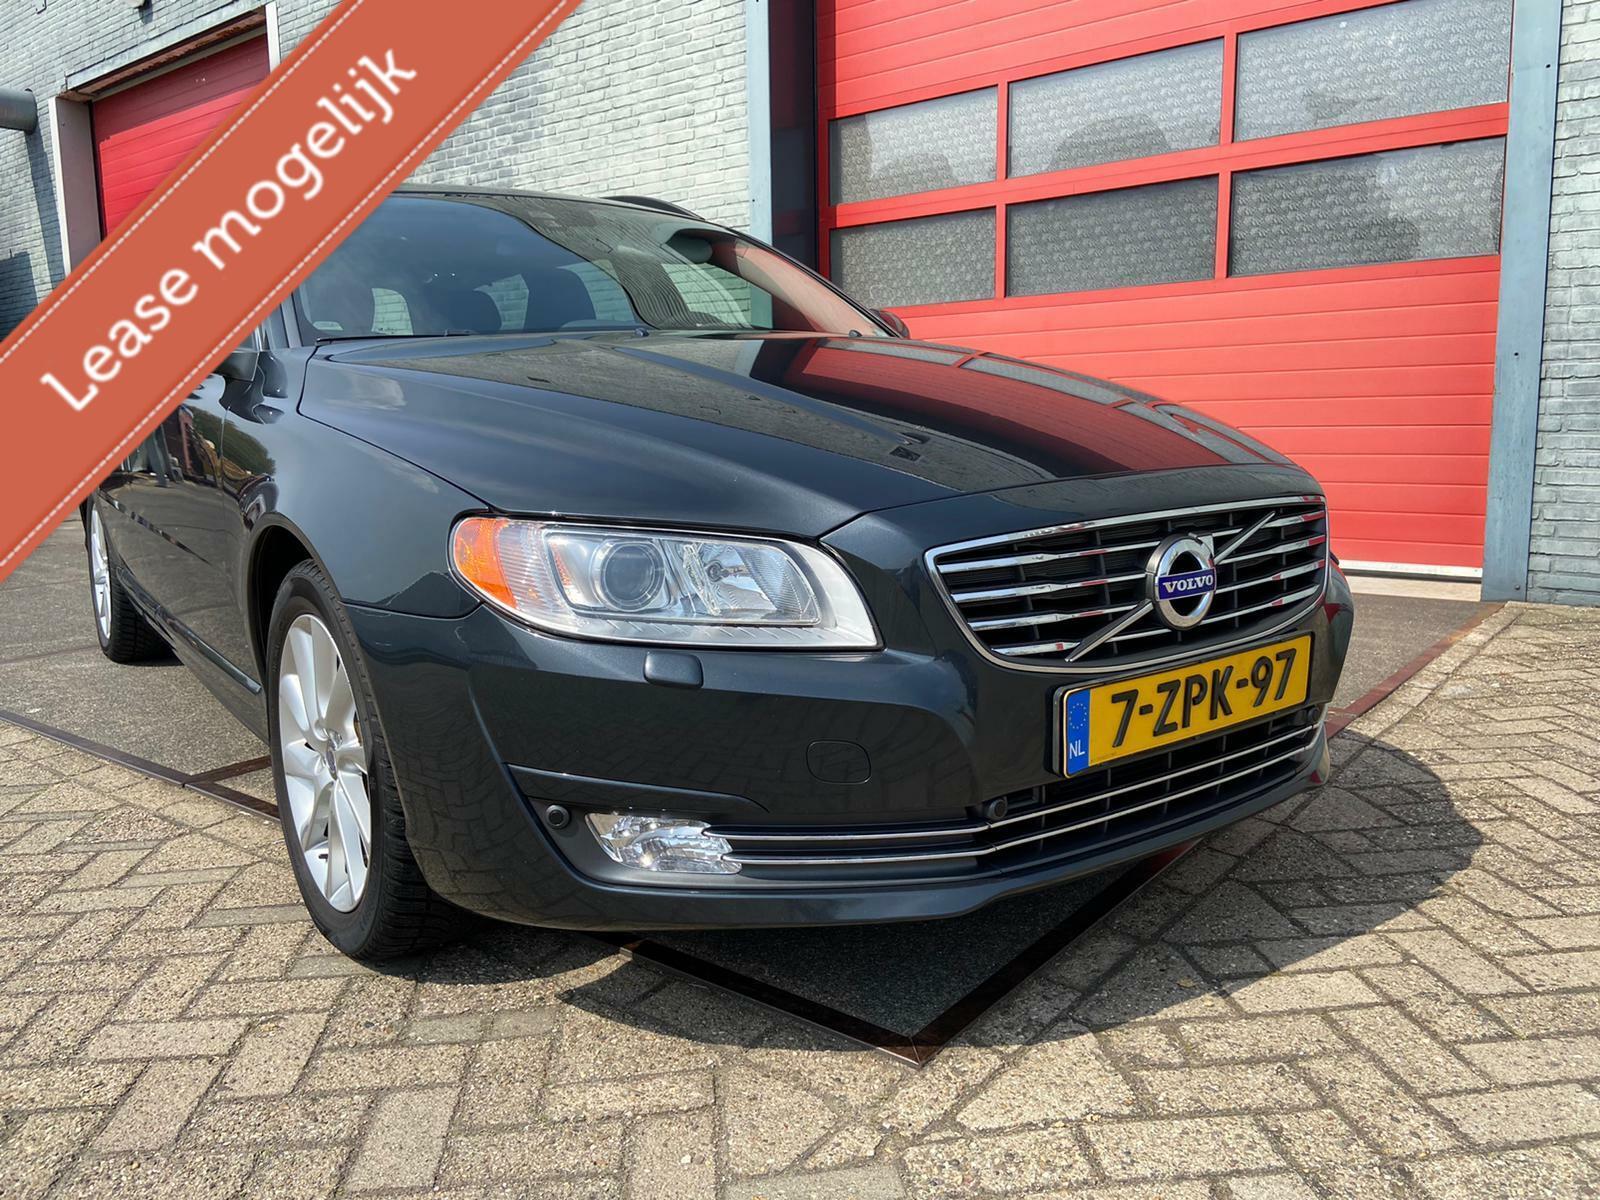 Volvo V70 1.6 D2 Autom. vanaf € 188.00 p/mnd te rijden